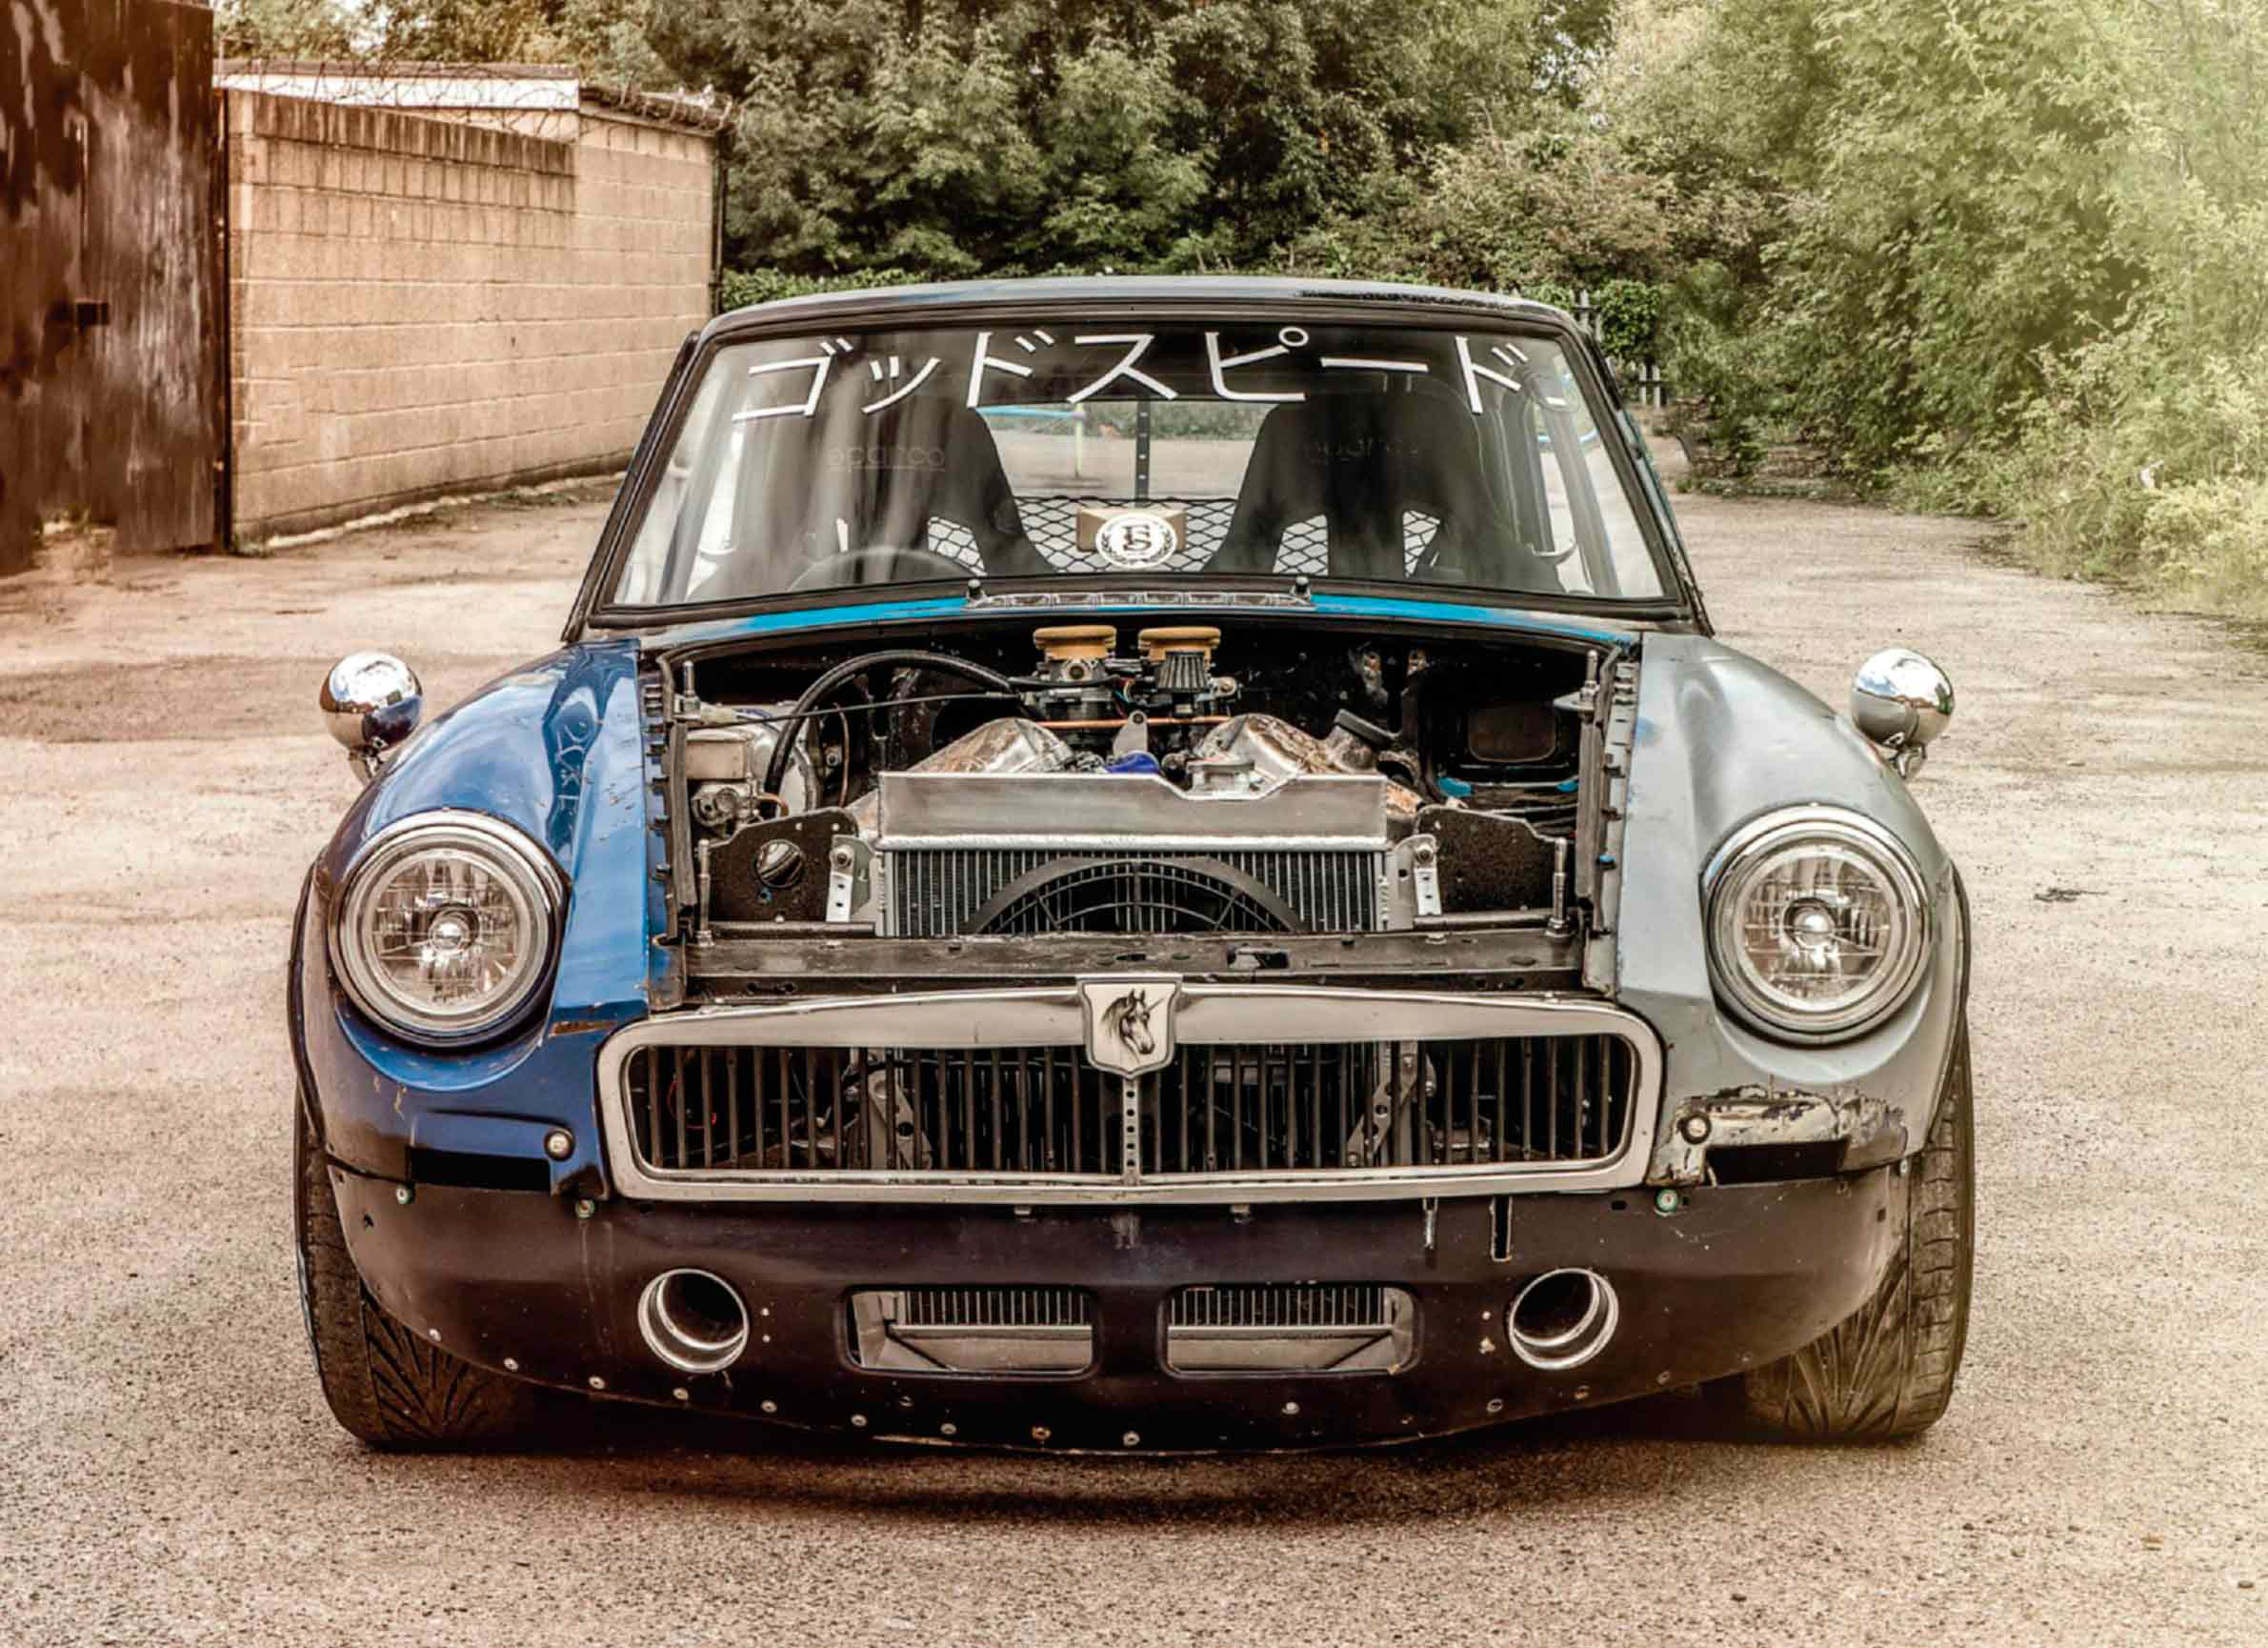 300bhp Jaguar AJ30 3 0-litre V6-engined MGB - Drive-My Blogs